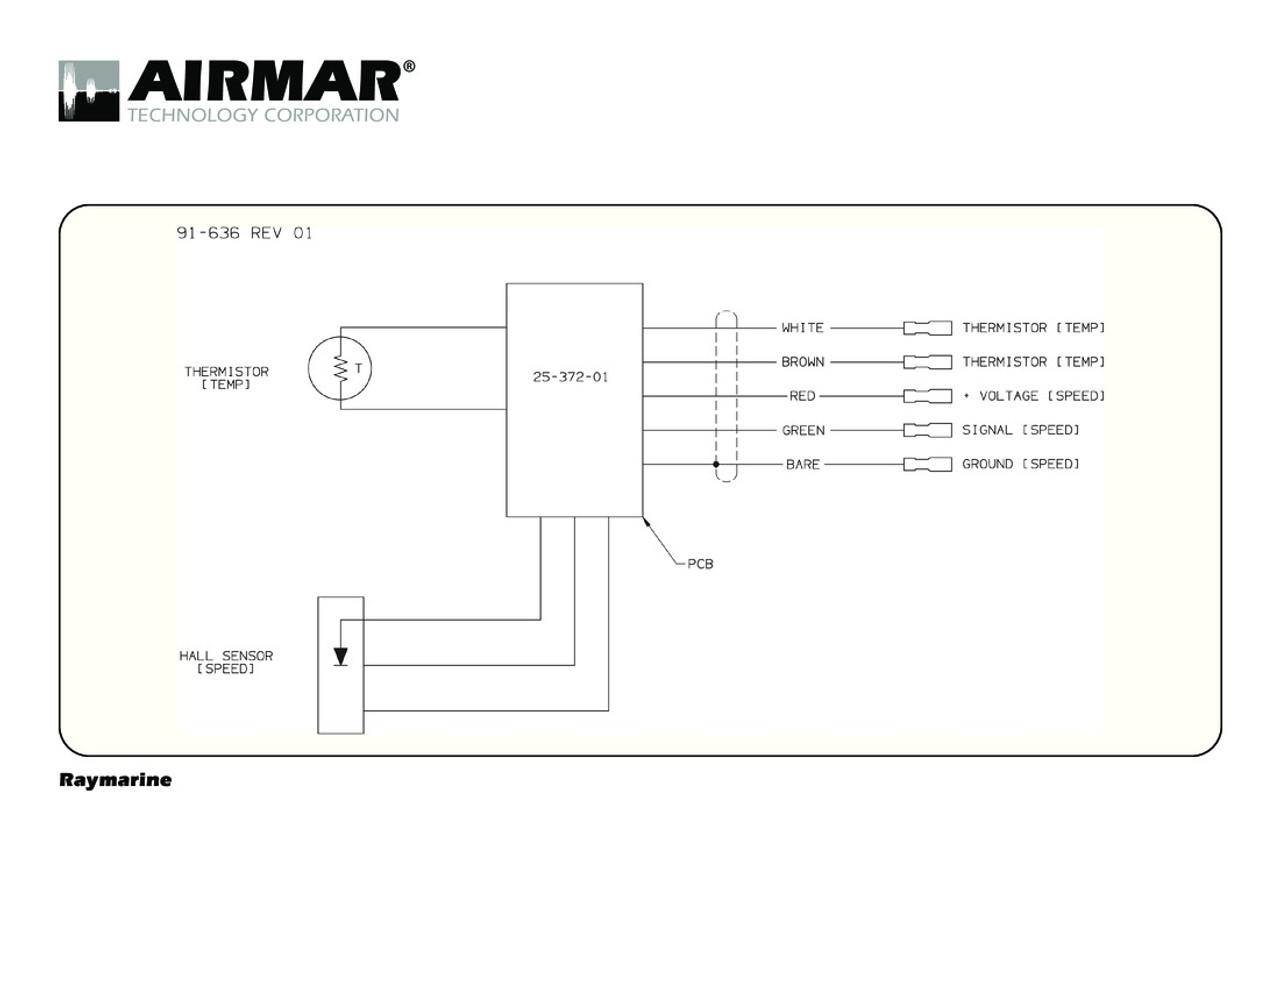 airmar wiring diagram raymarine iso blue bottle marine raymarine autopilot wiring-diagram raymarine radar wiring diagram #14